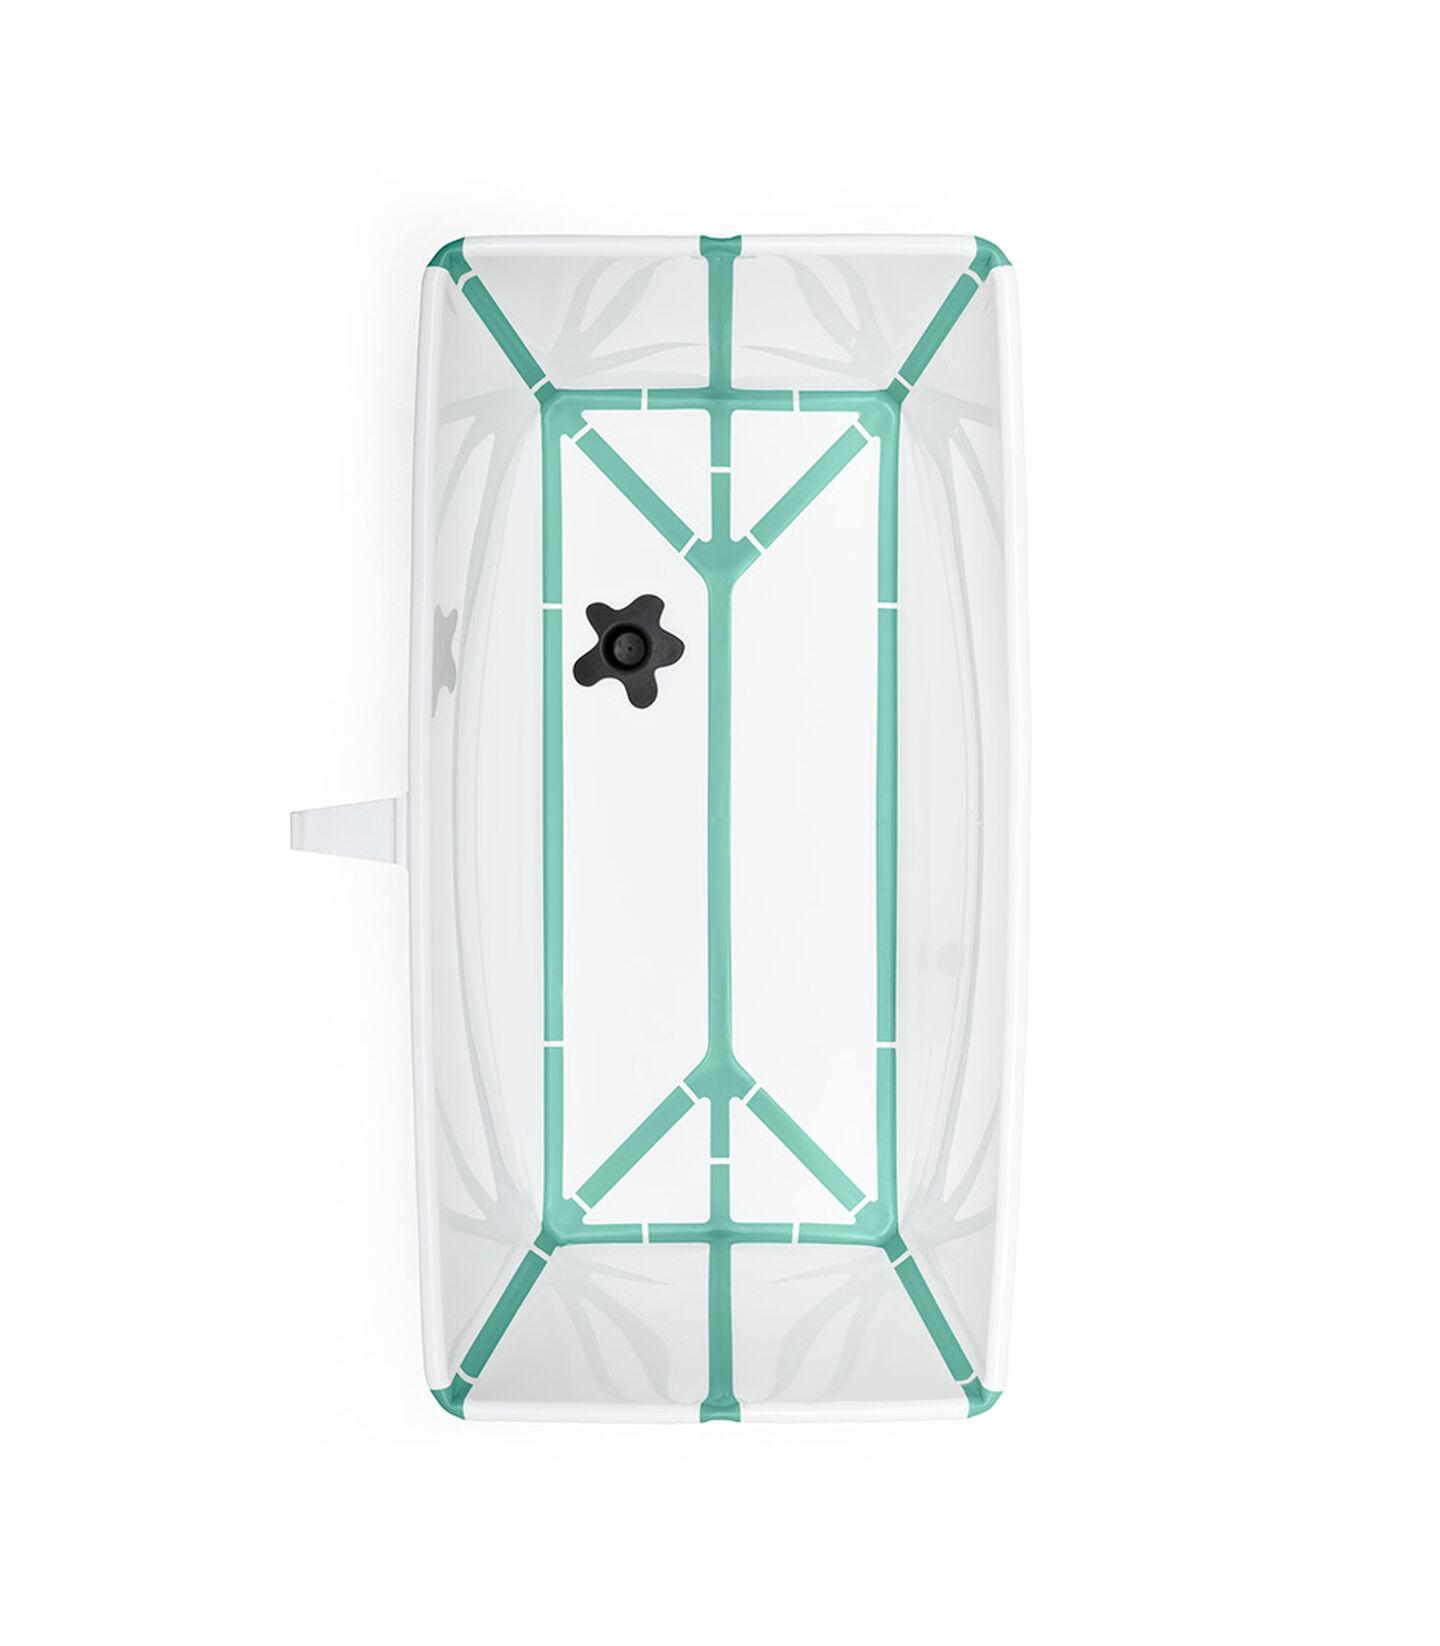 Stokke® Flexi Bath® Heat White Aqua, White Aqua, mainview view 5